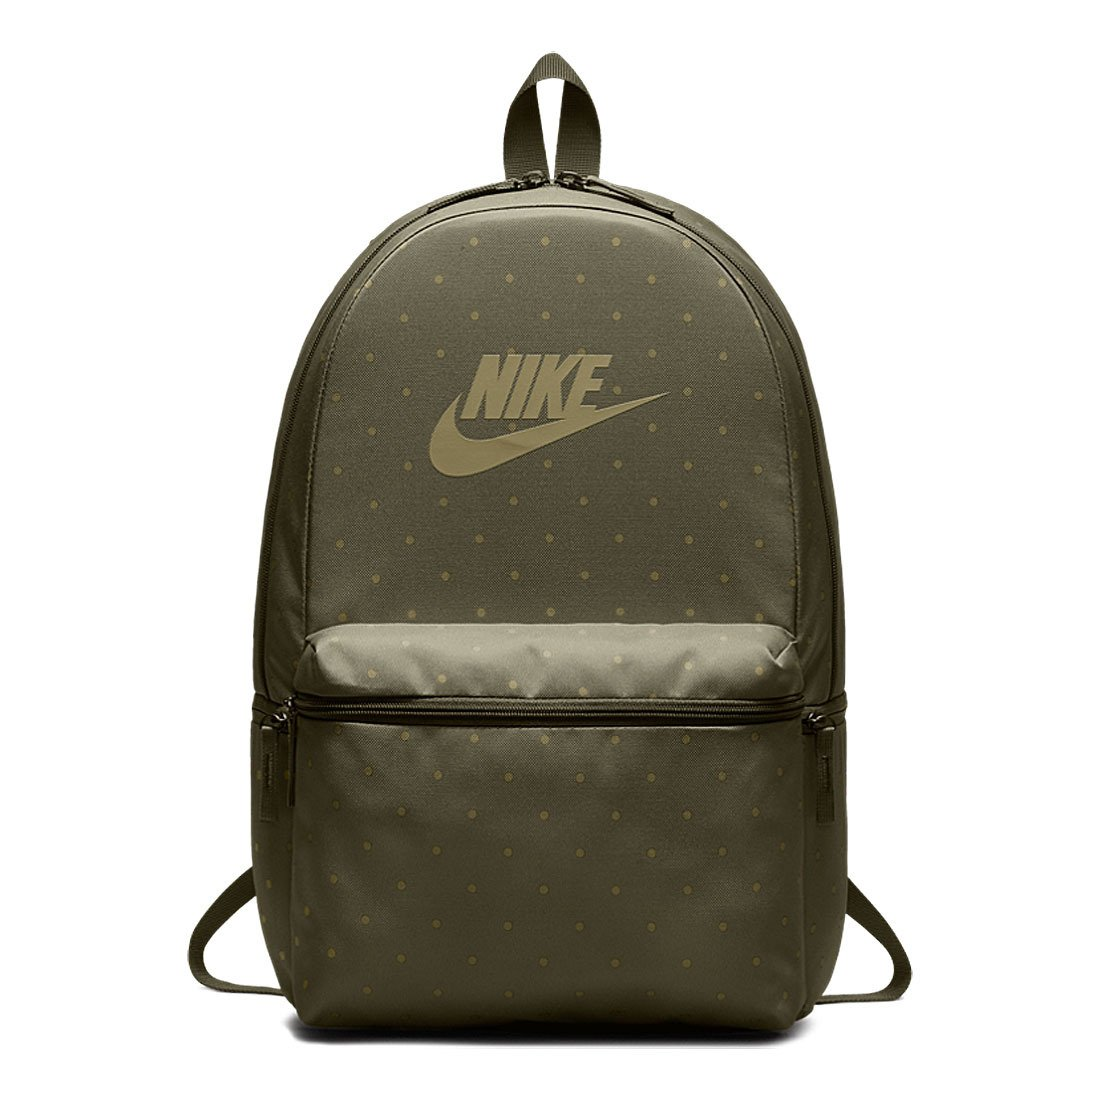 2479b856a2421 ... Zielony plecak szkolny Nike Hertiage Backpack BA5761-222 ...